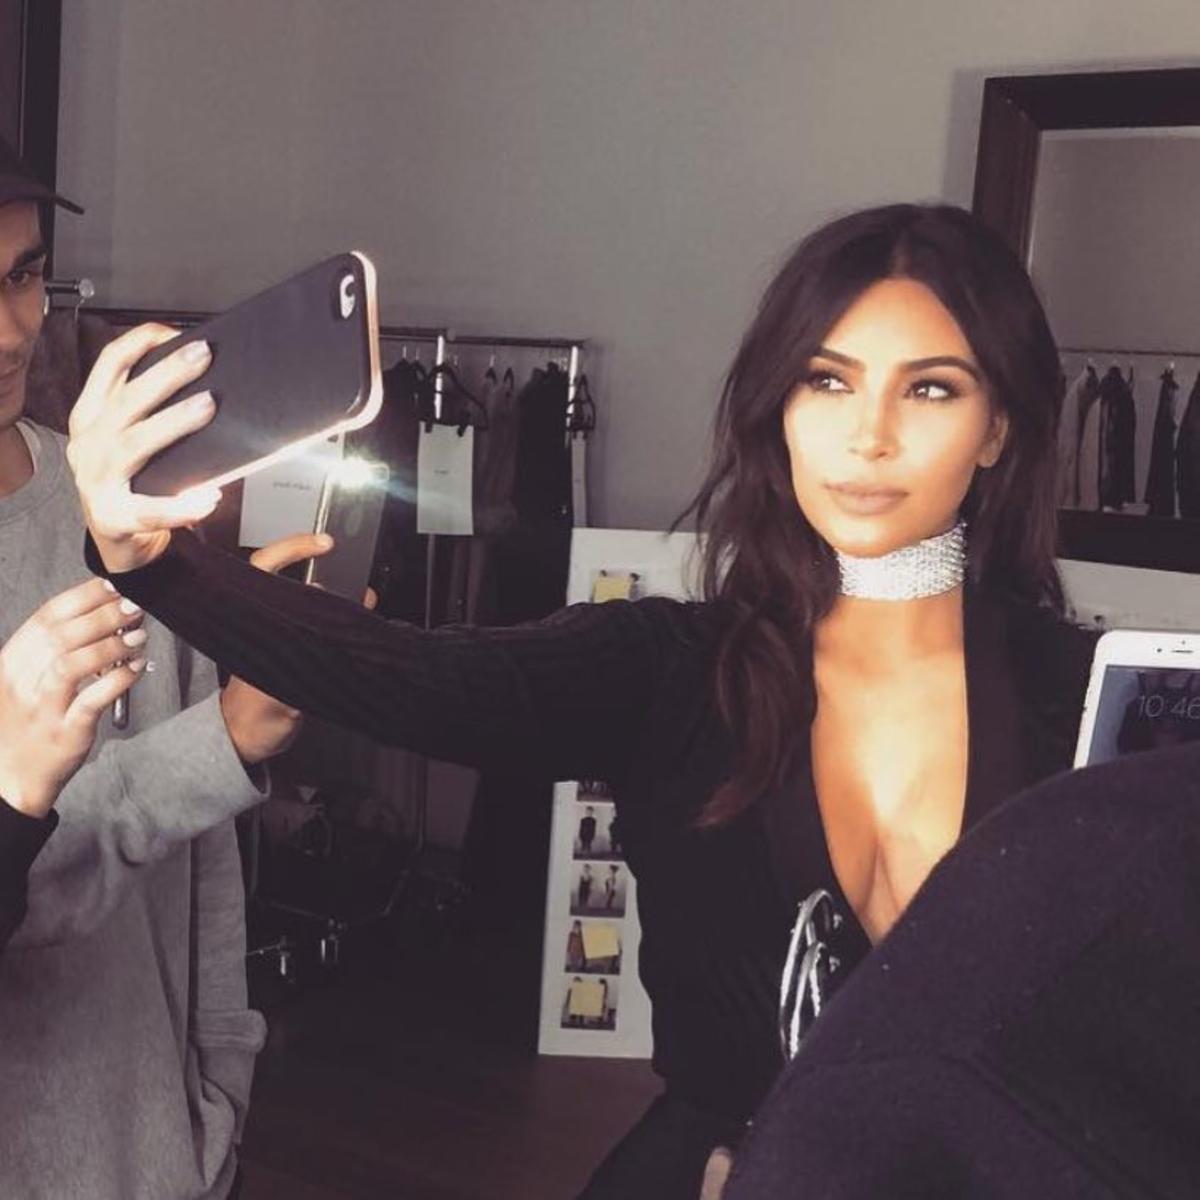 Kim Kardashian LuMee phone cases